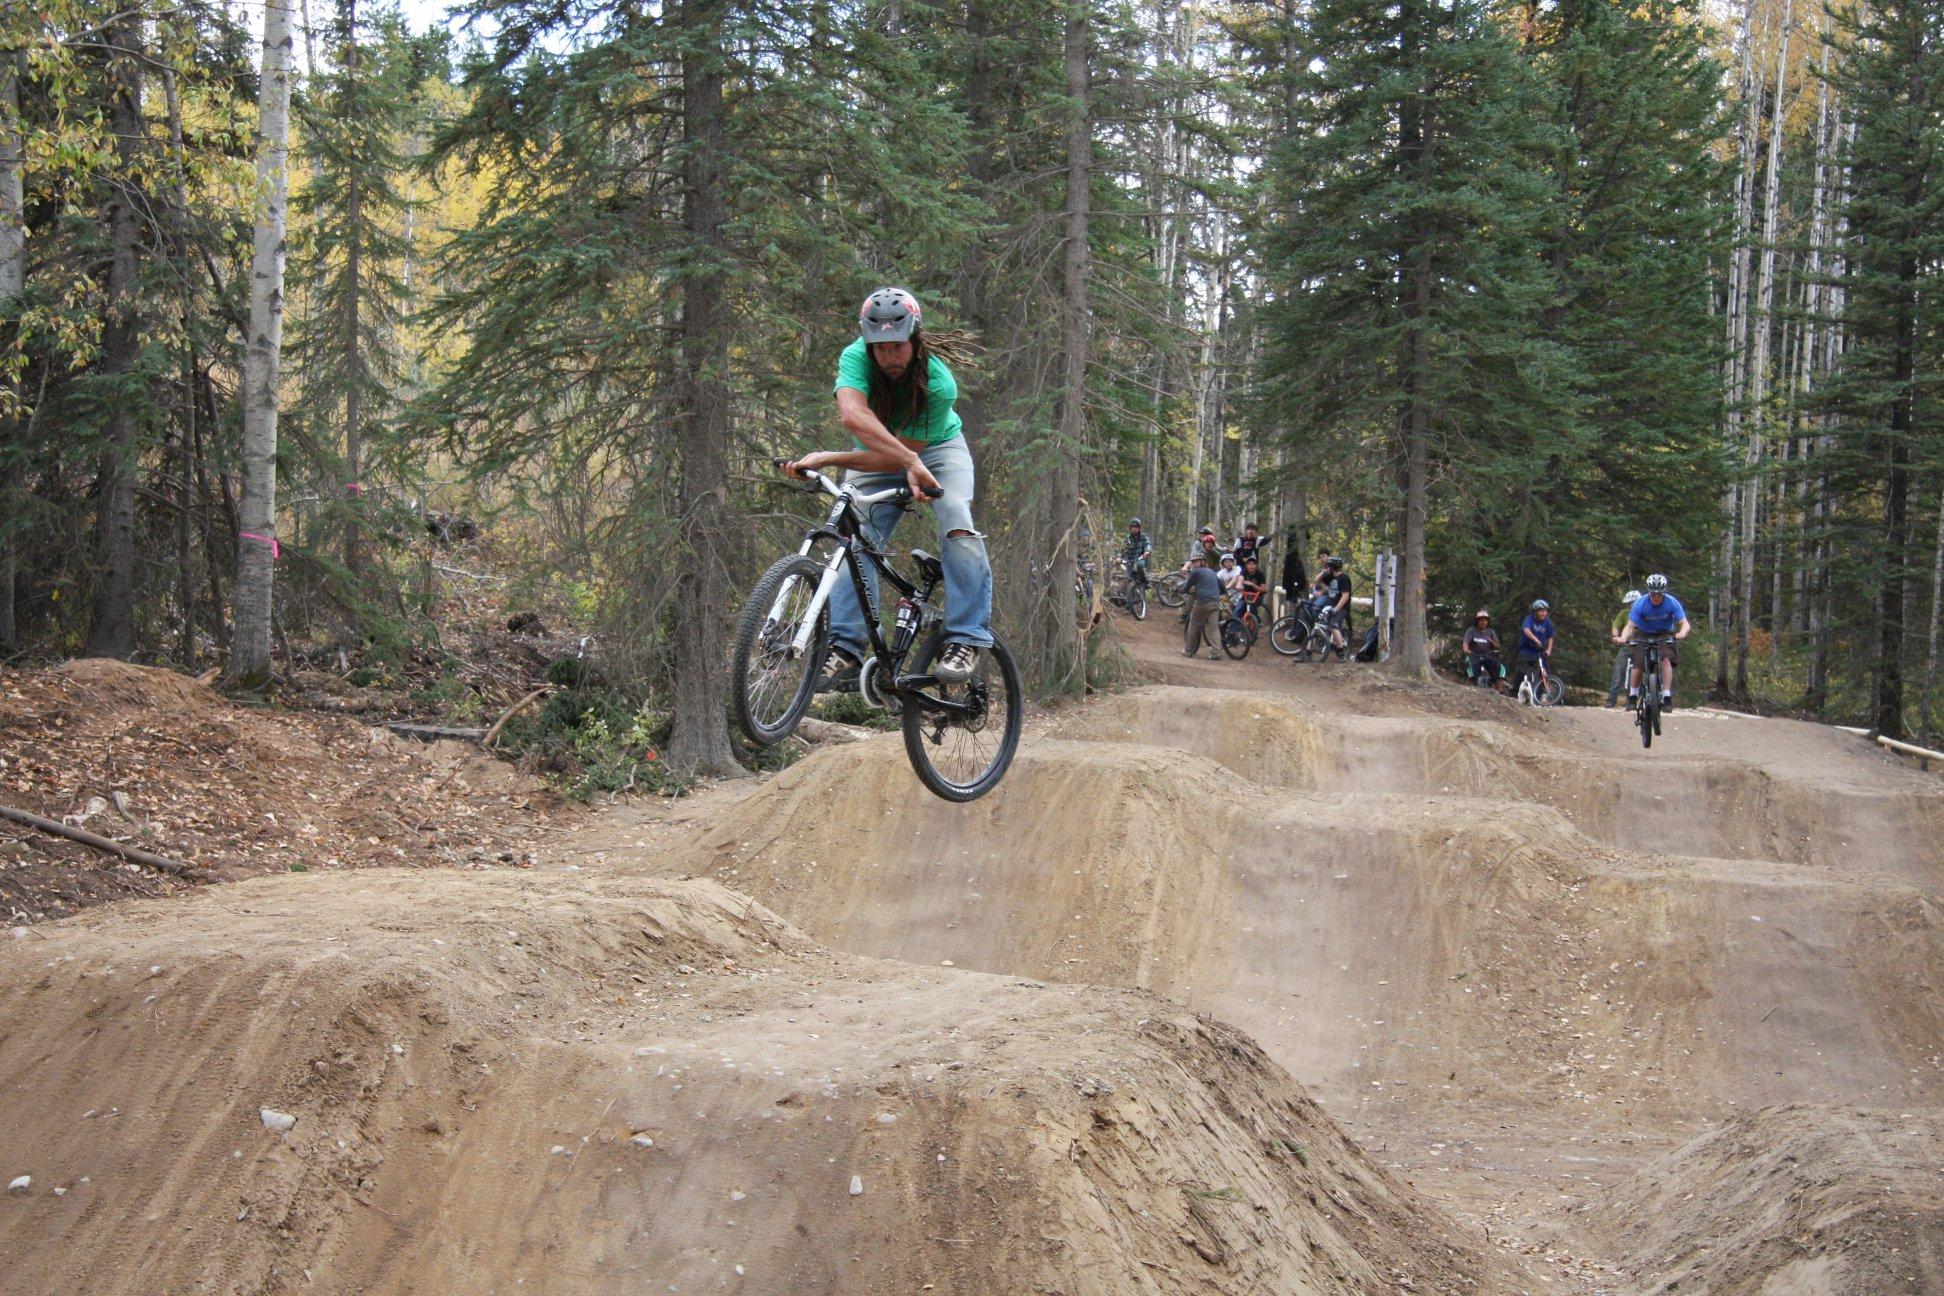 Jay Hoots on Dirt Jumps